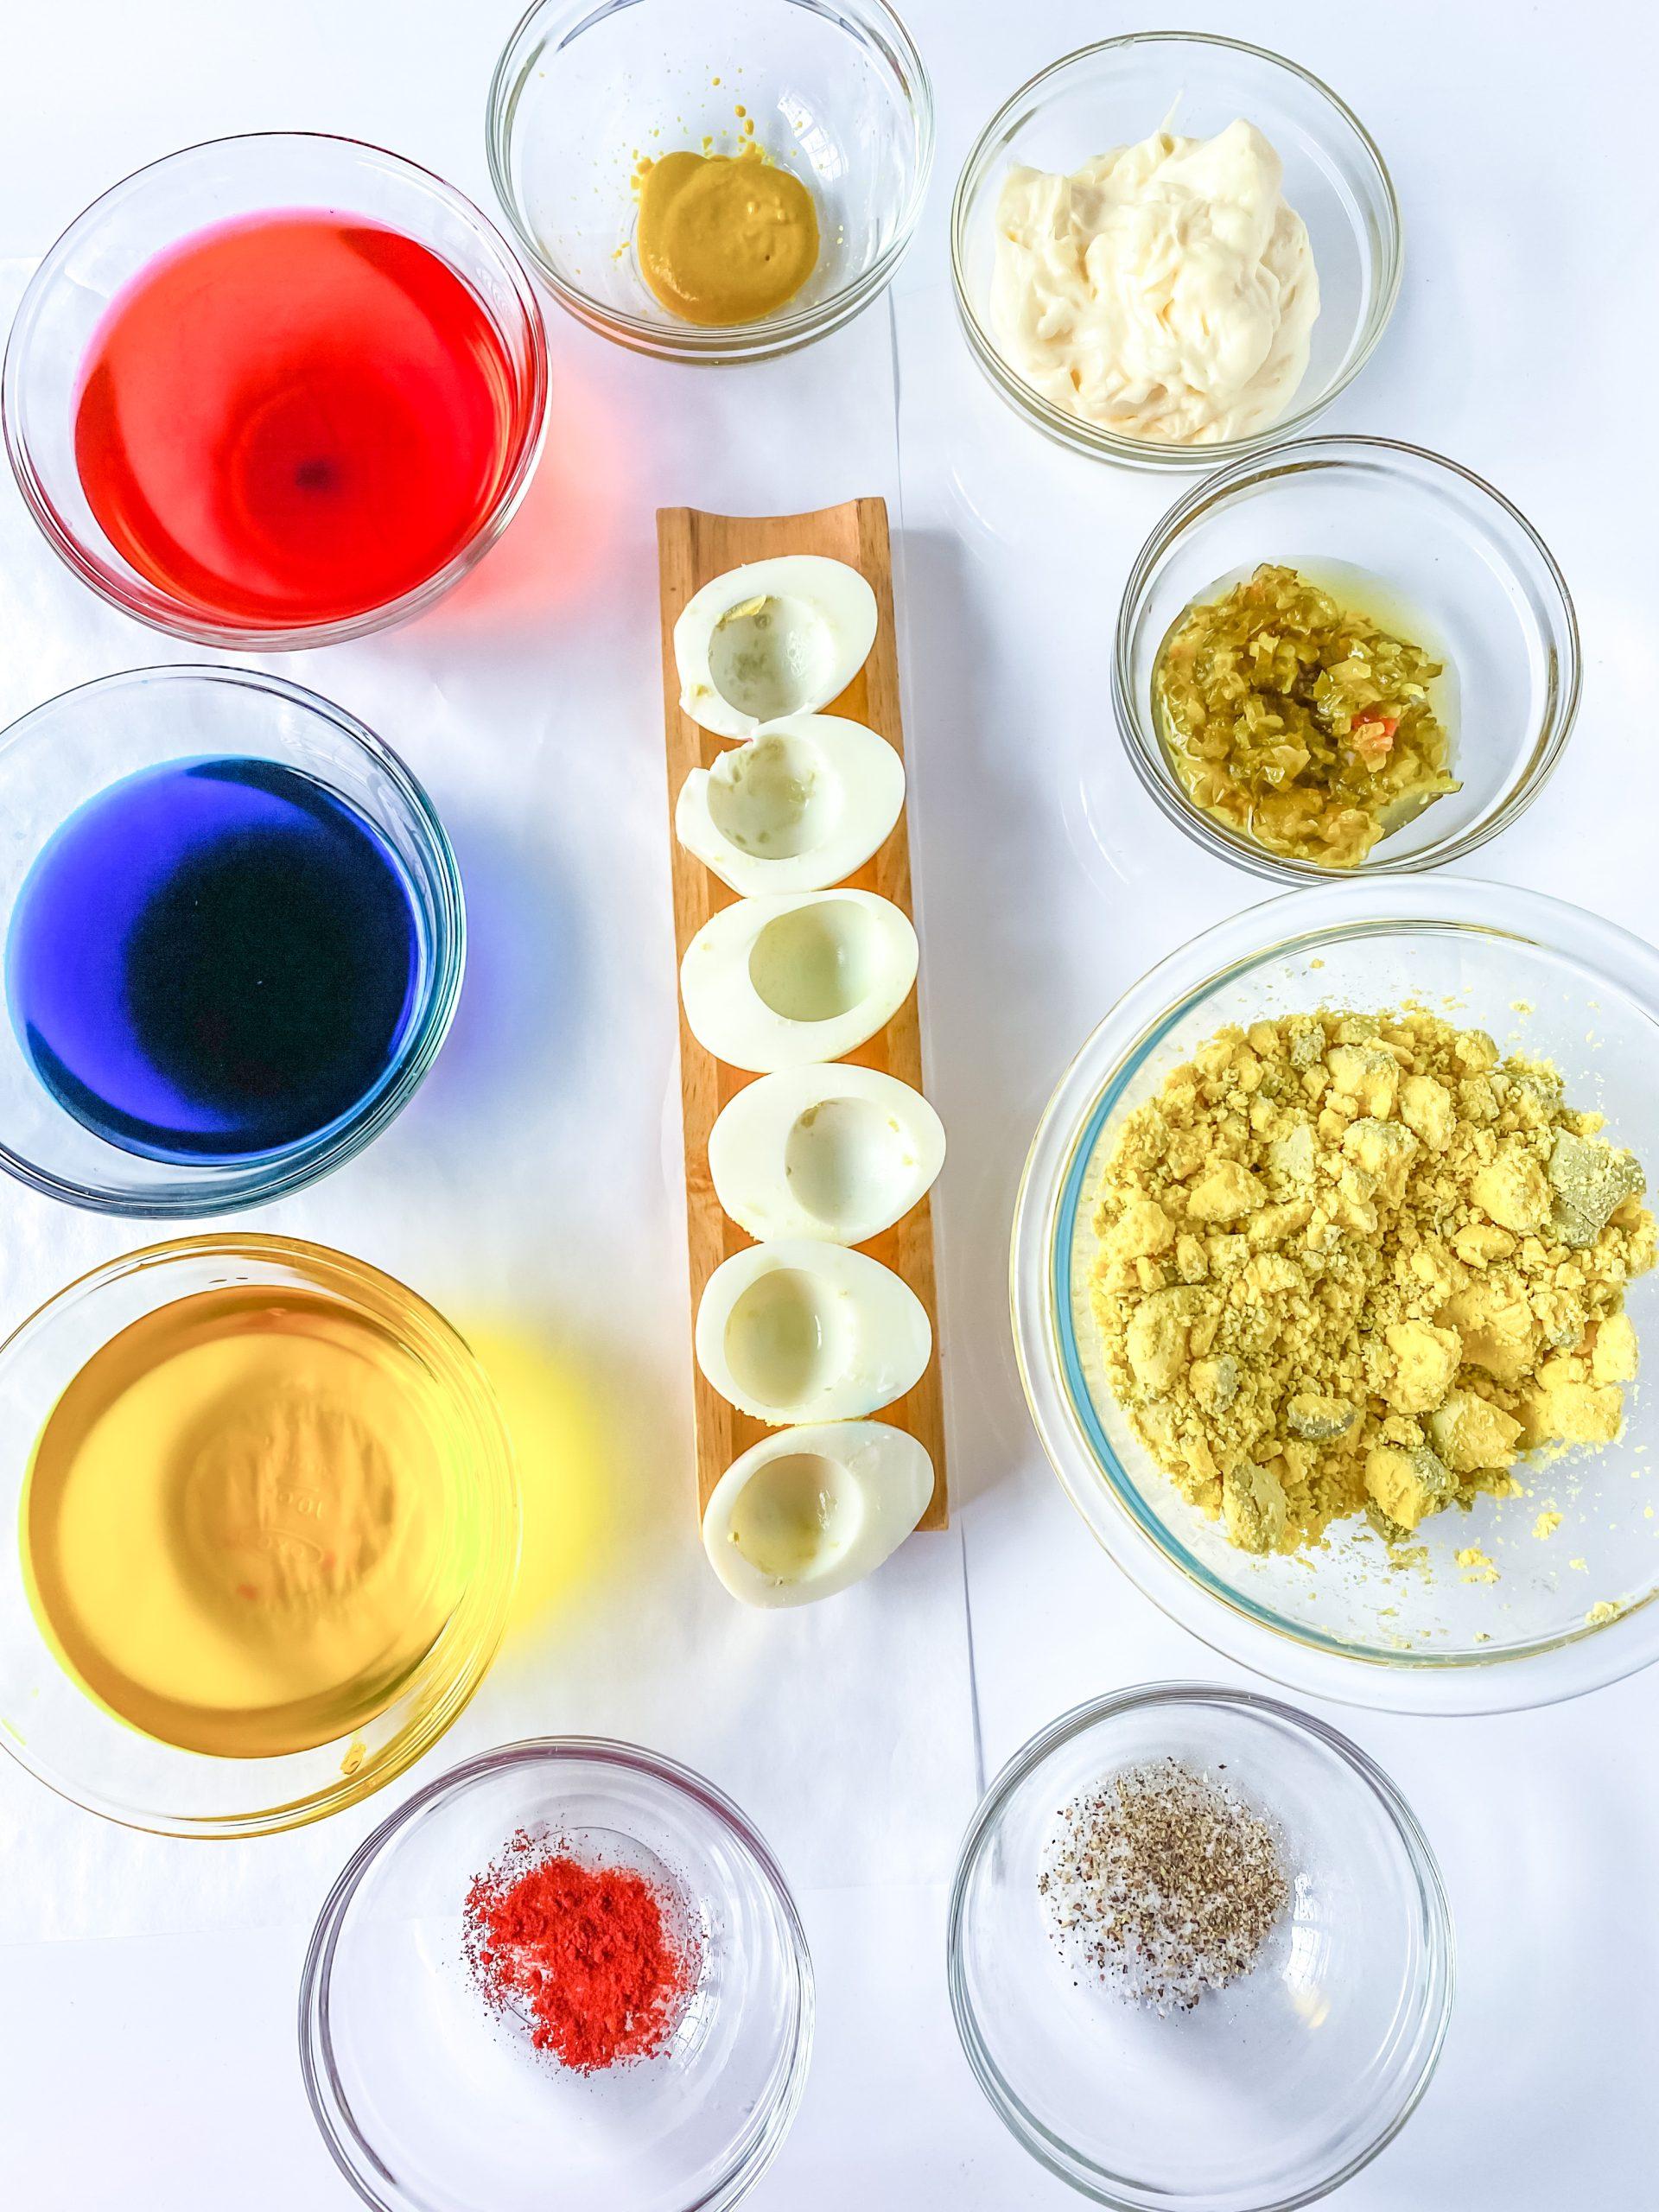 colored deviled egg ingredients